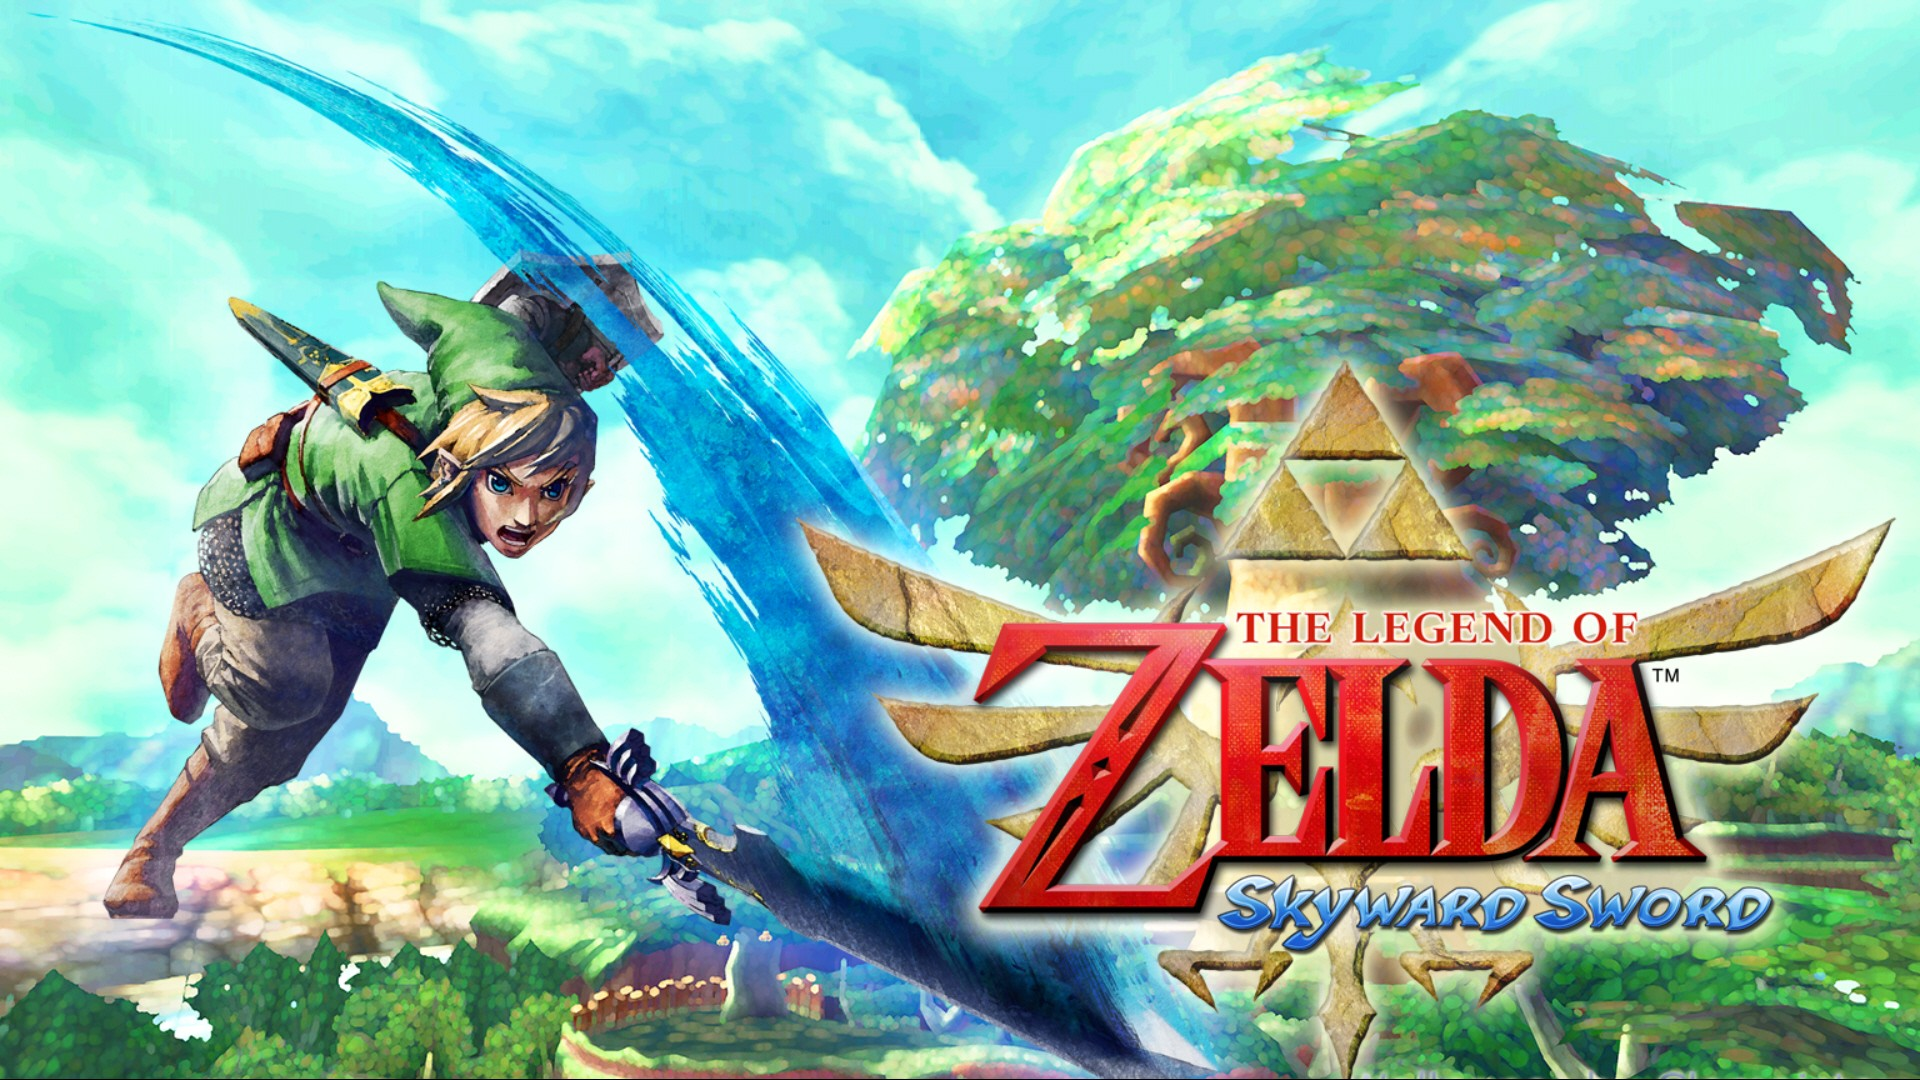 The Legend Of Zelda Skyward Sword HD Wallpaper